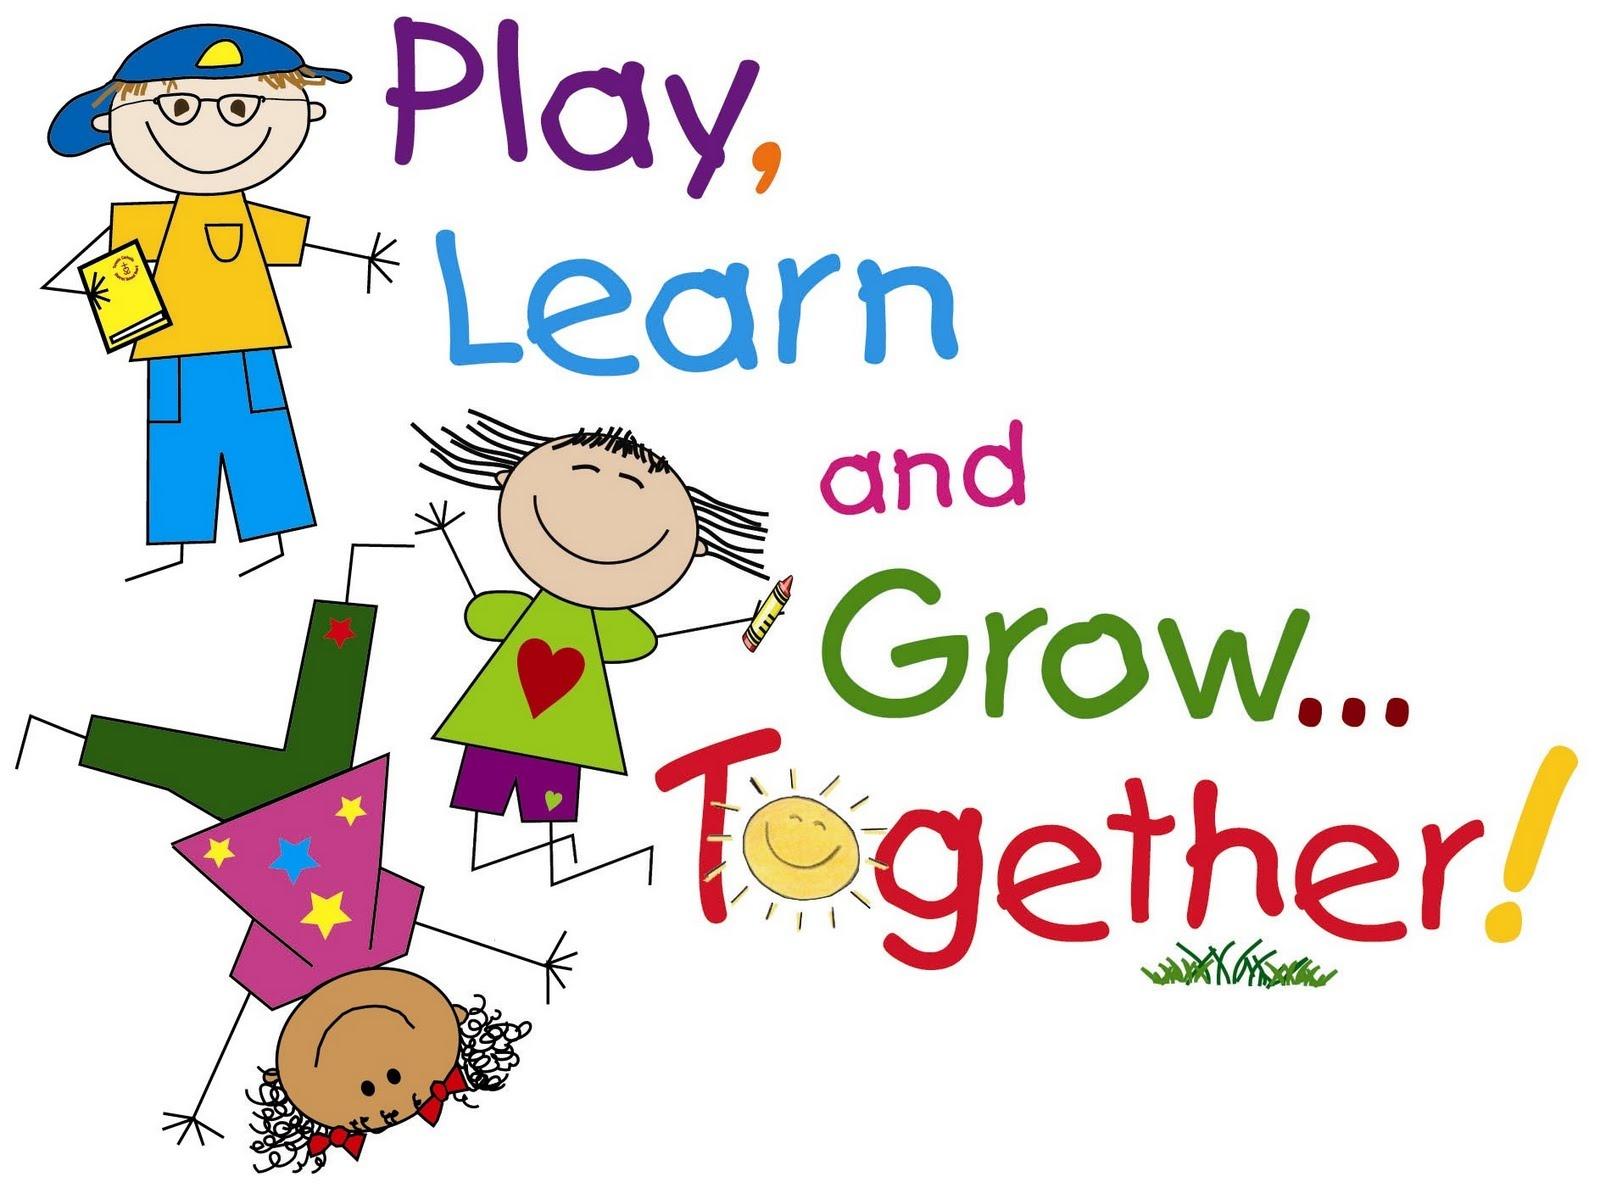 Free Printable Preschool Borders Clipart Images 8 - Wikiclipart - Free Printable Preschool Clip Art